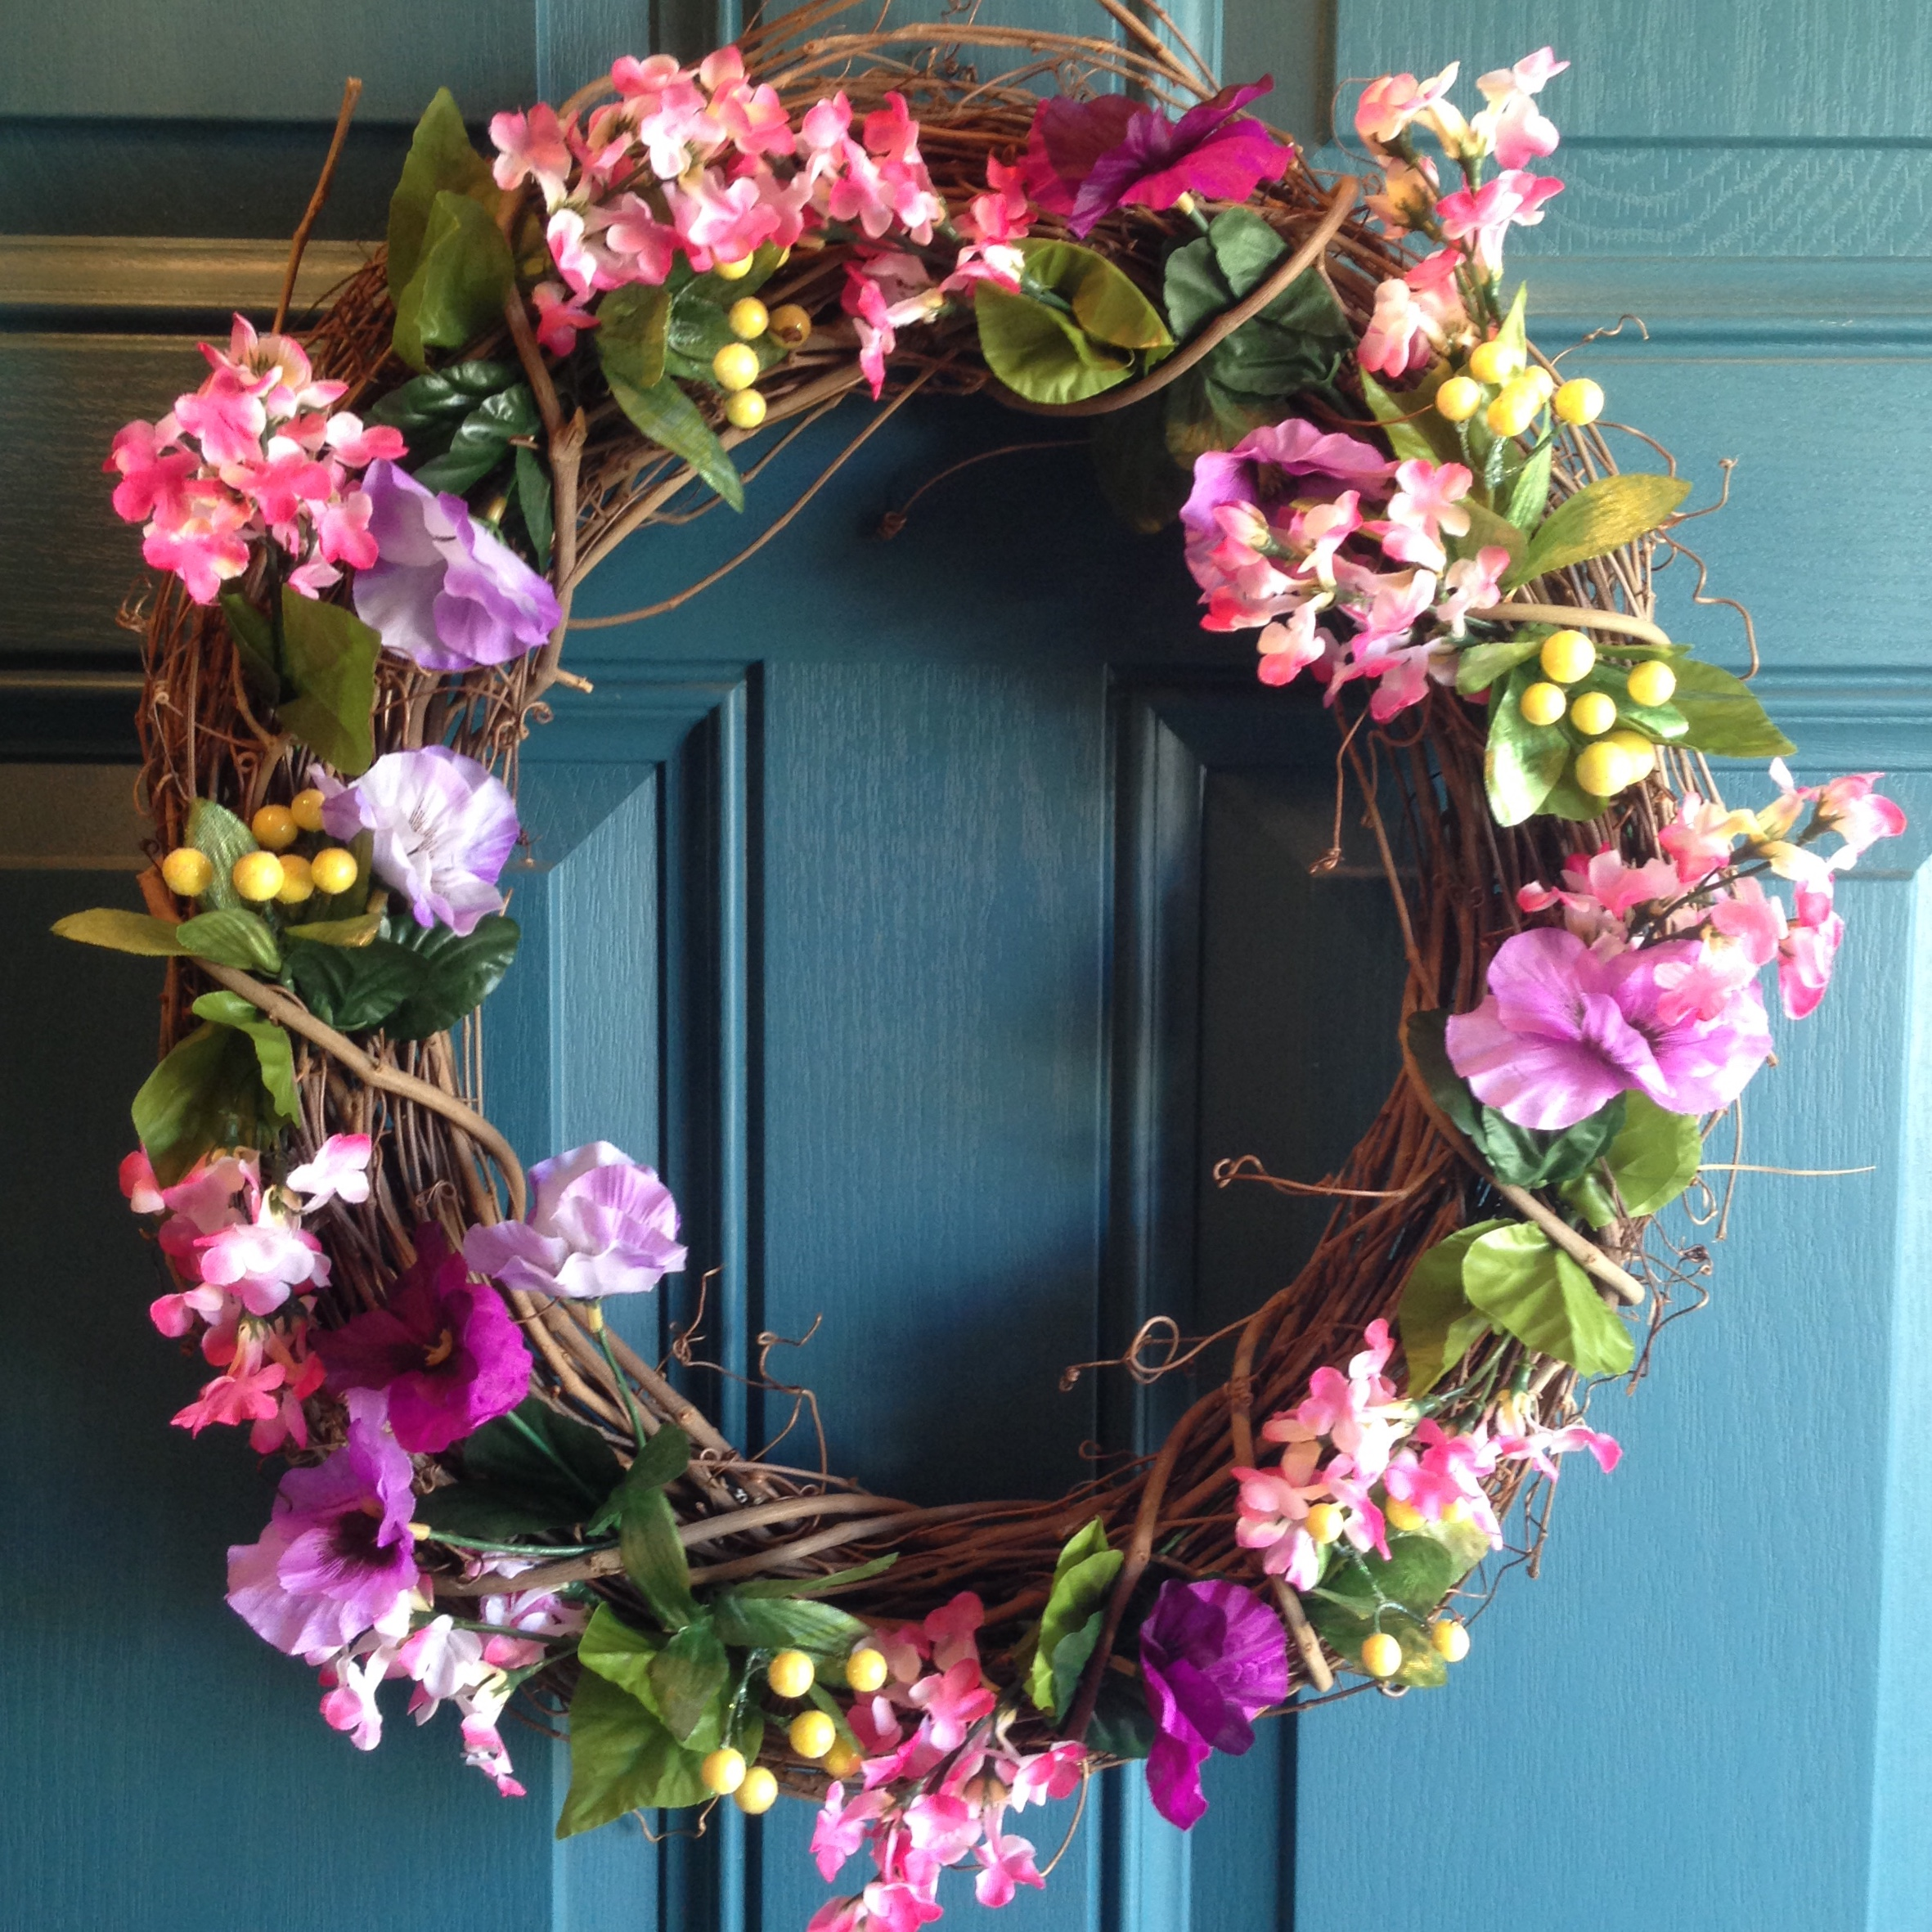 5 Minute DIY Spring Wreath